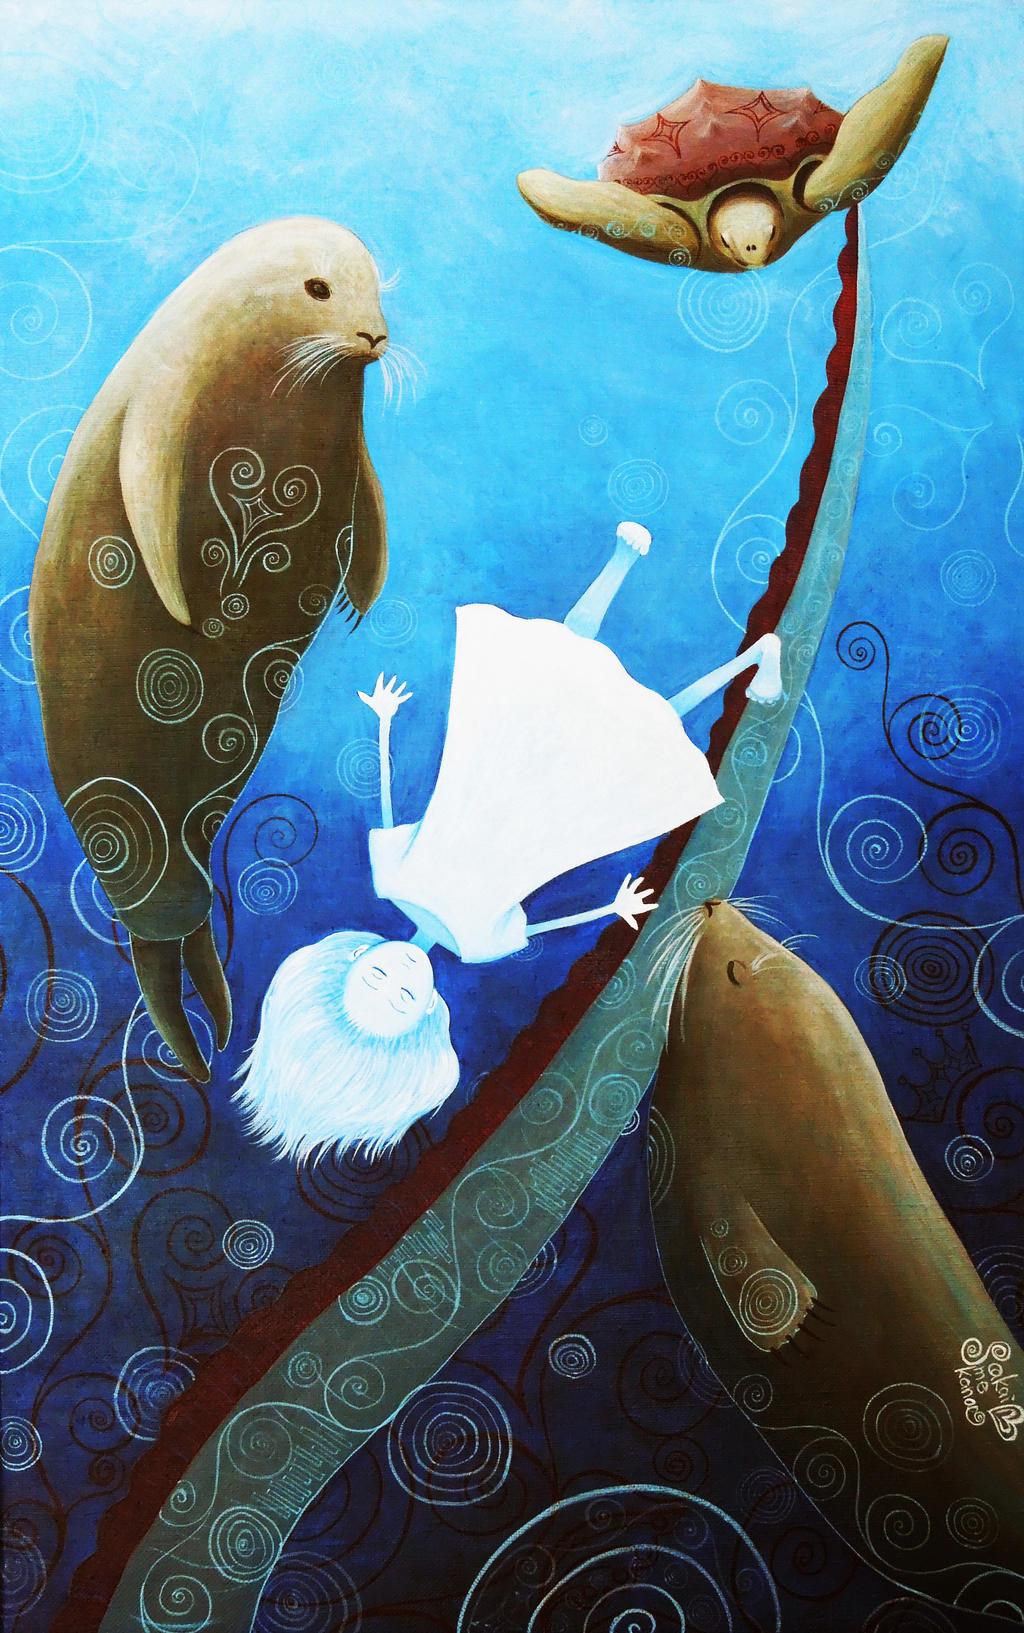 Into the sea by SakaimeKanae